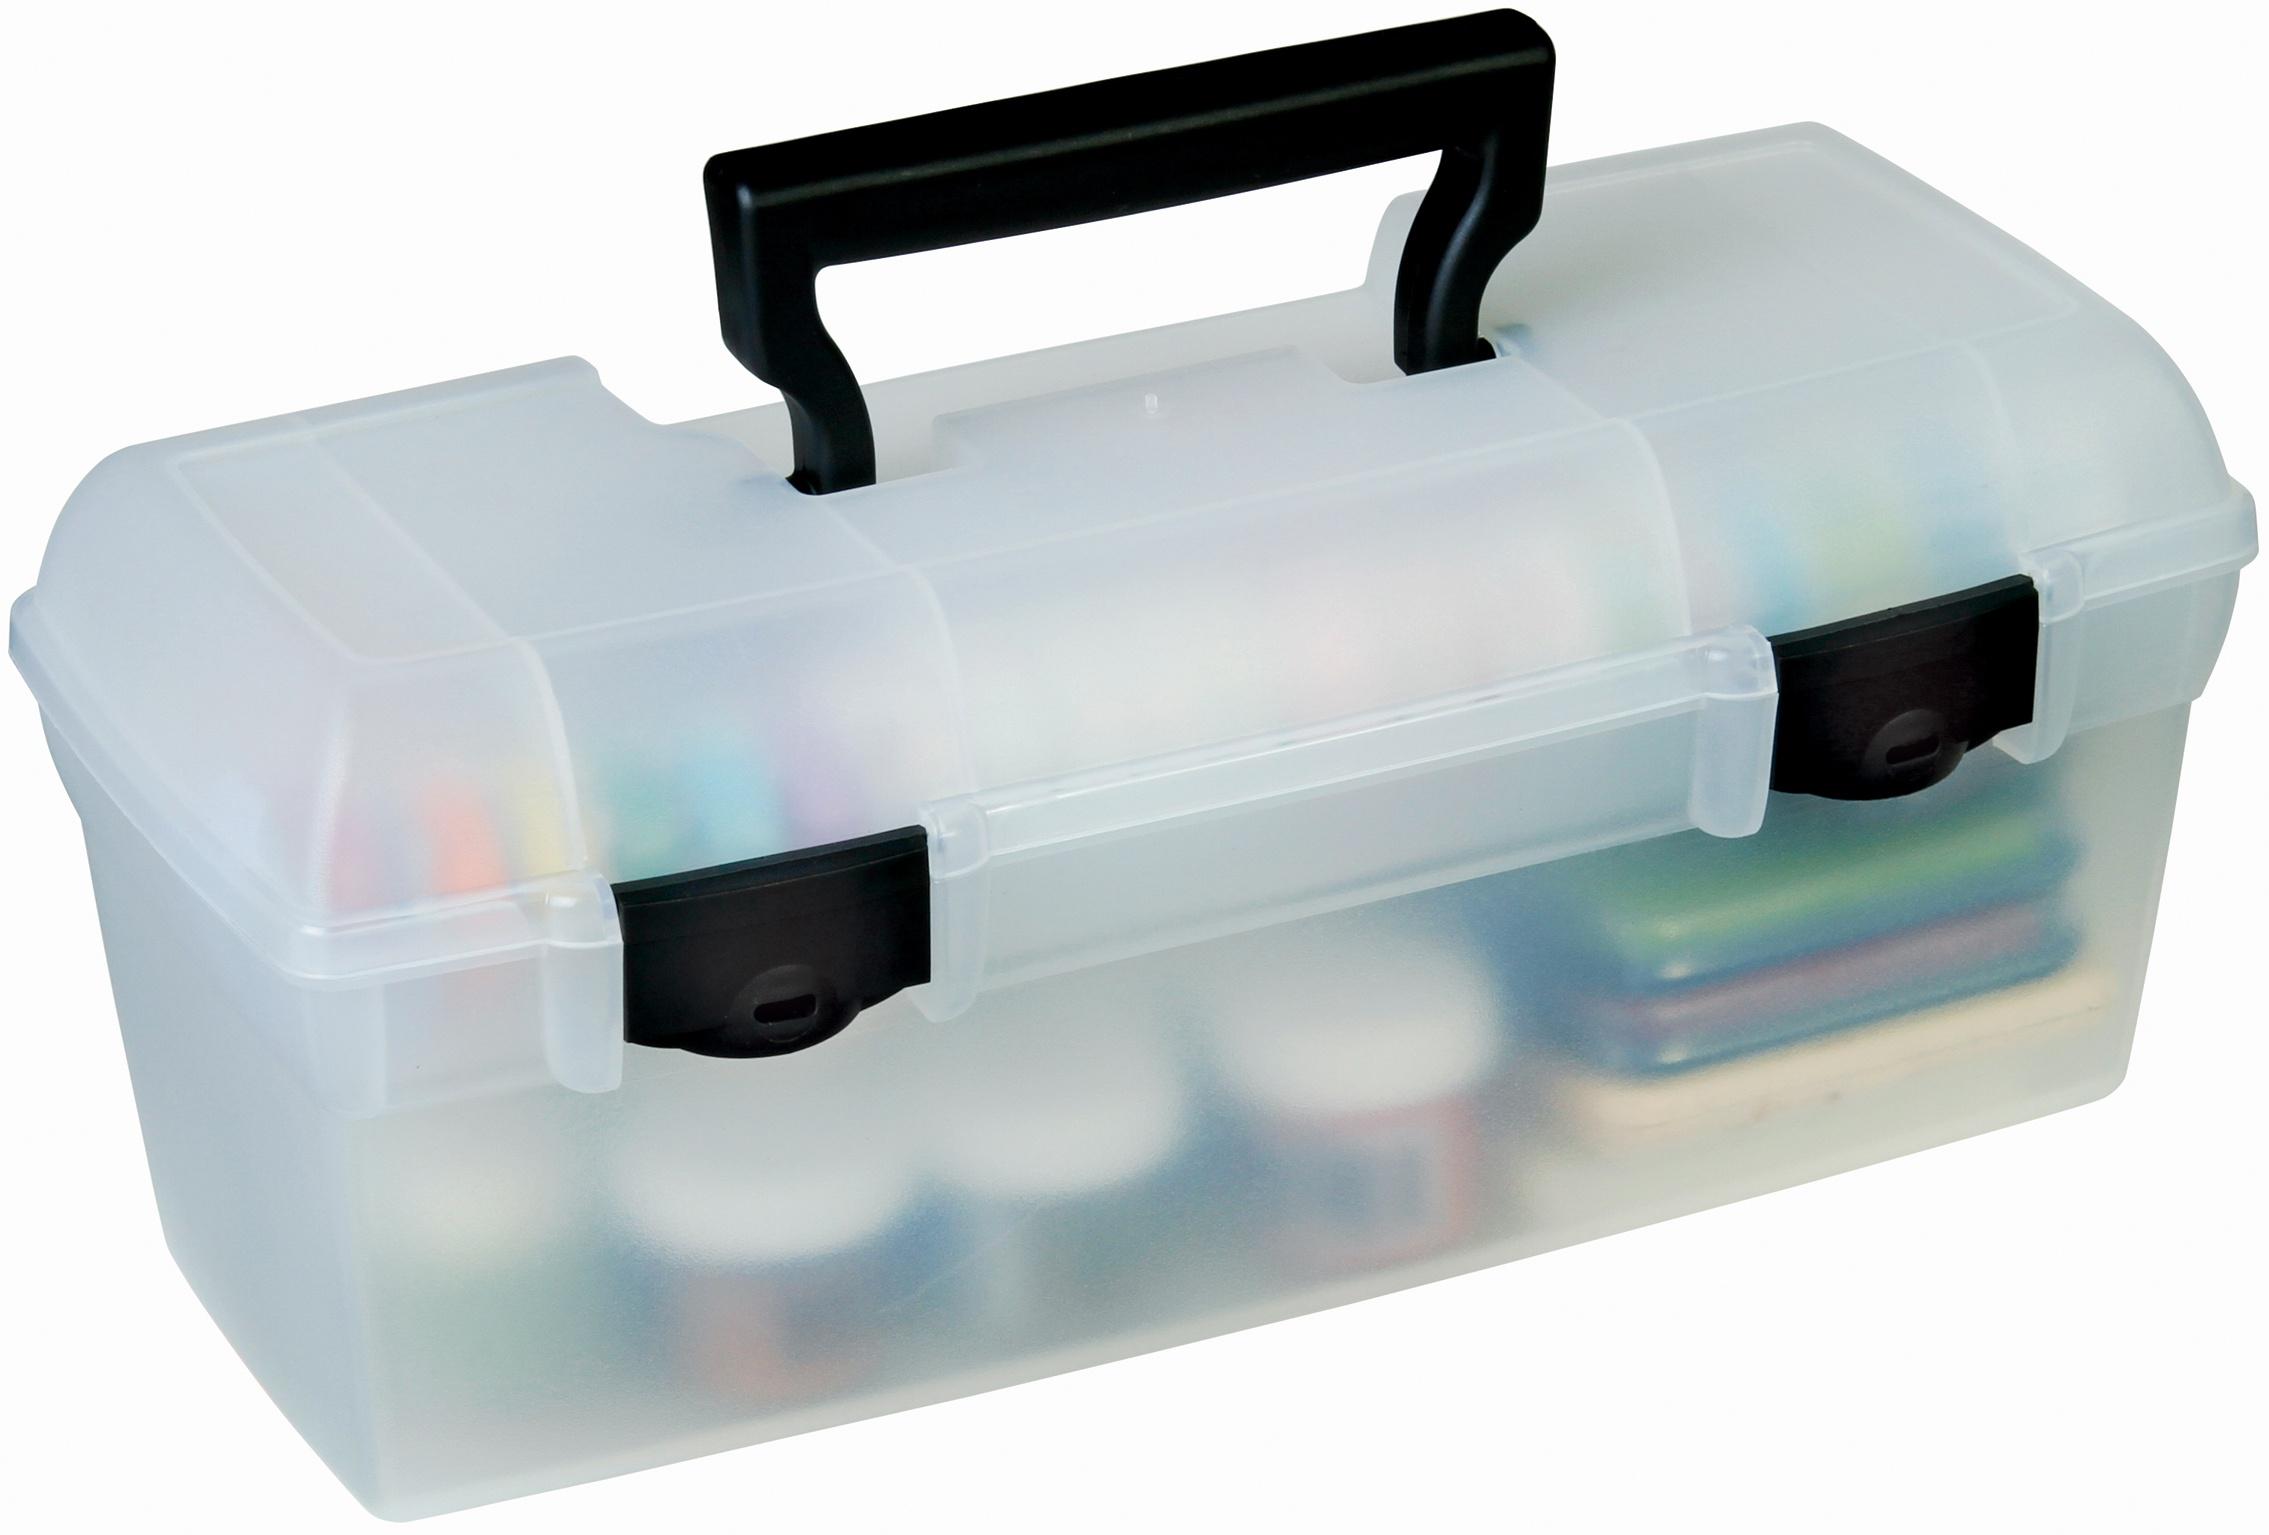 Artbin Essentials Lift Out Tray Box 13